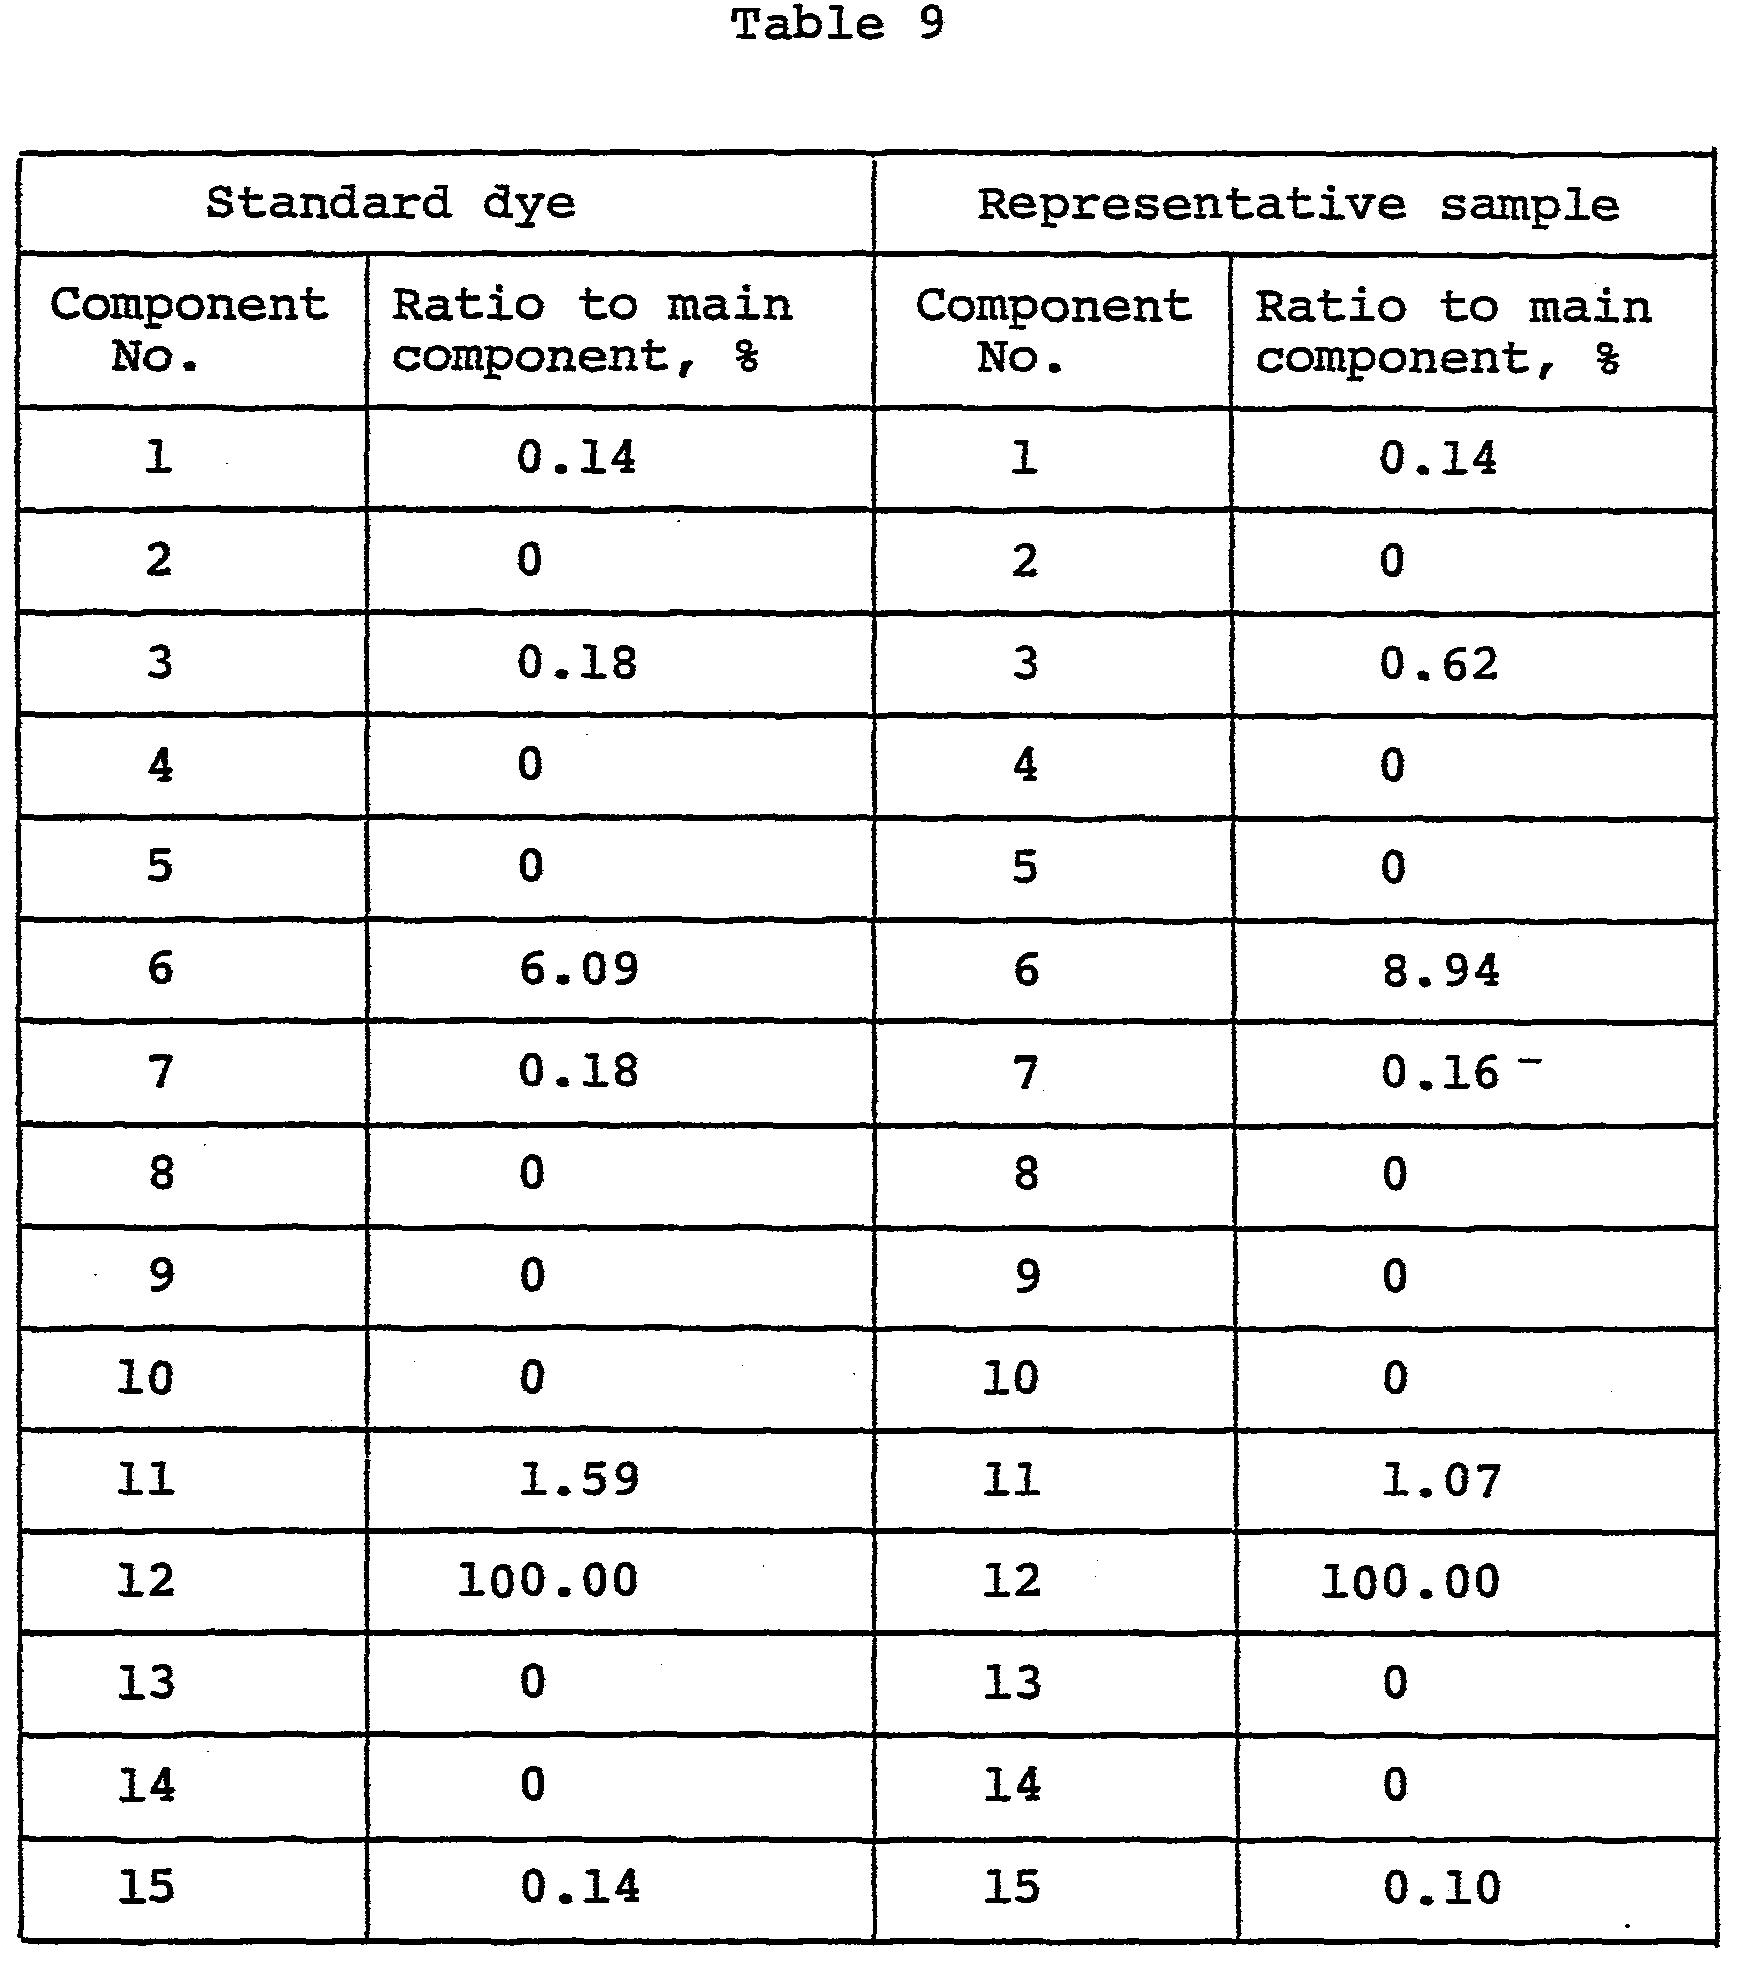 Saybolt Color Chart Wwwtopsimagescom